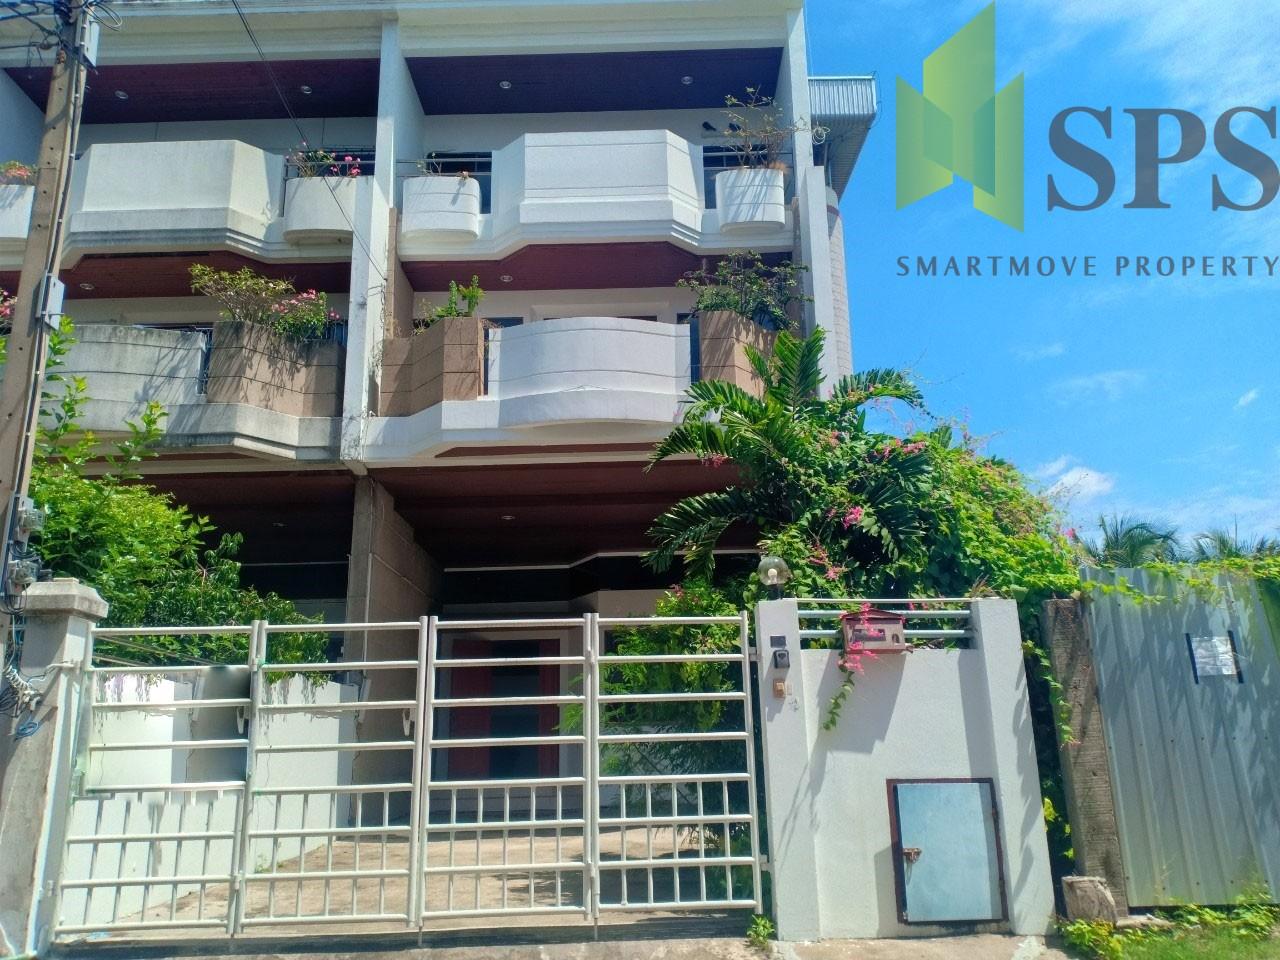 For Rent Home office / Town Home ให้เช่า โฮมออฟฟิศ ใกล้ BTS บางจาก (Property ID: SPS-PA233)